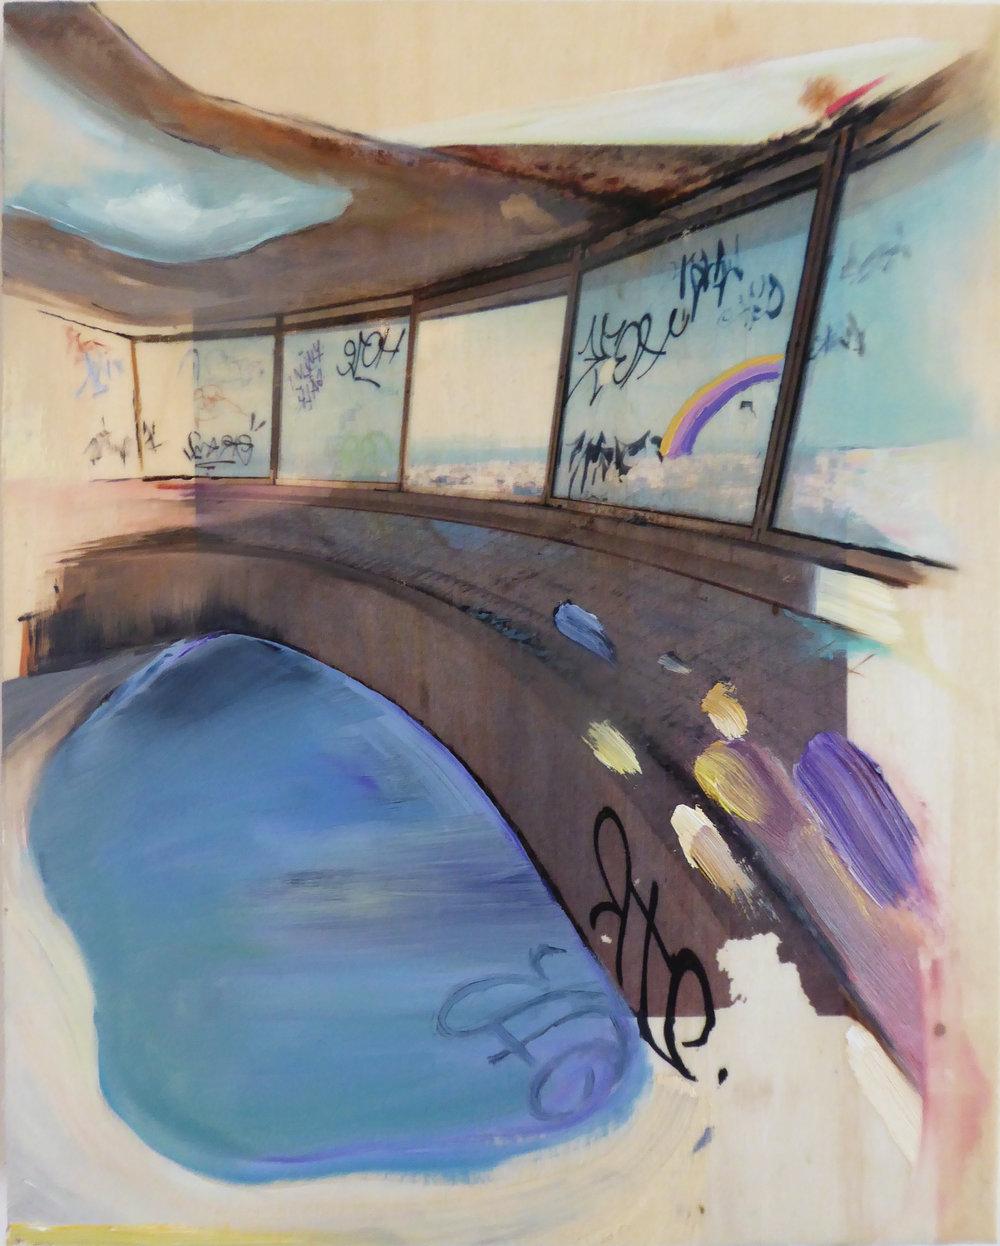 Graffiti and Rainbow, 2017 - Oil / mixed media on birch panel10